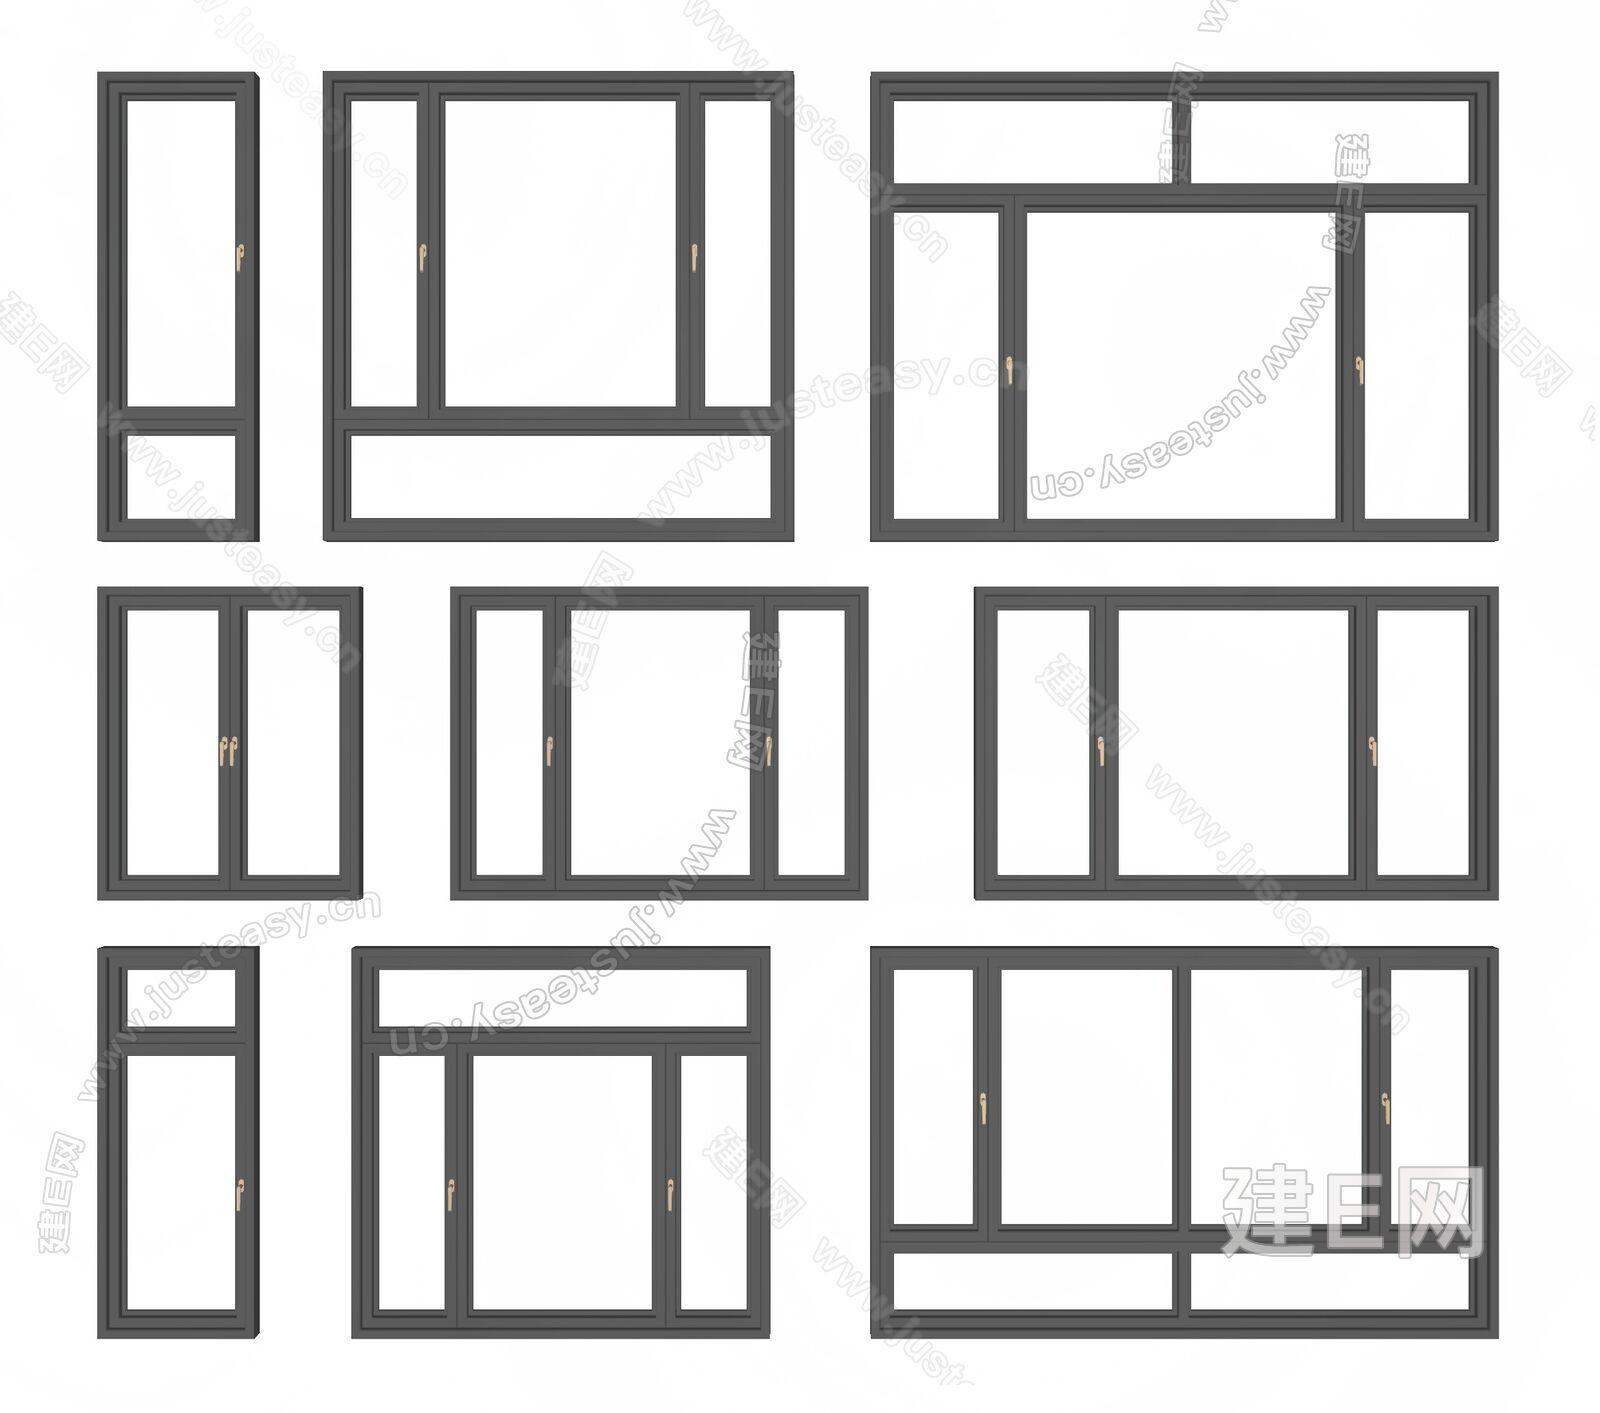 现代窗户组合sketchup模型